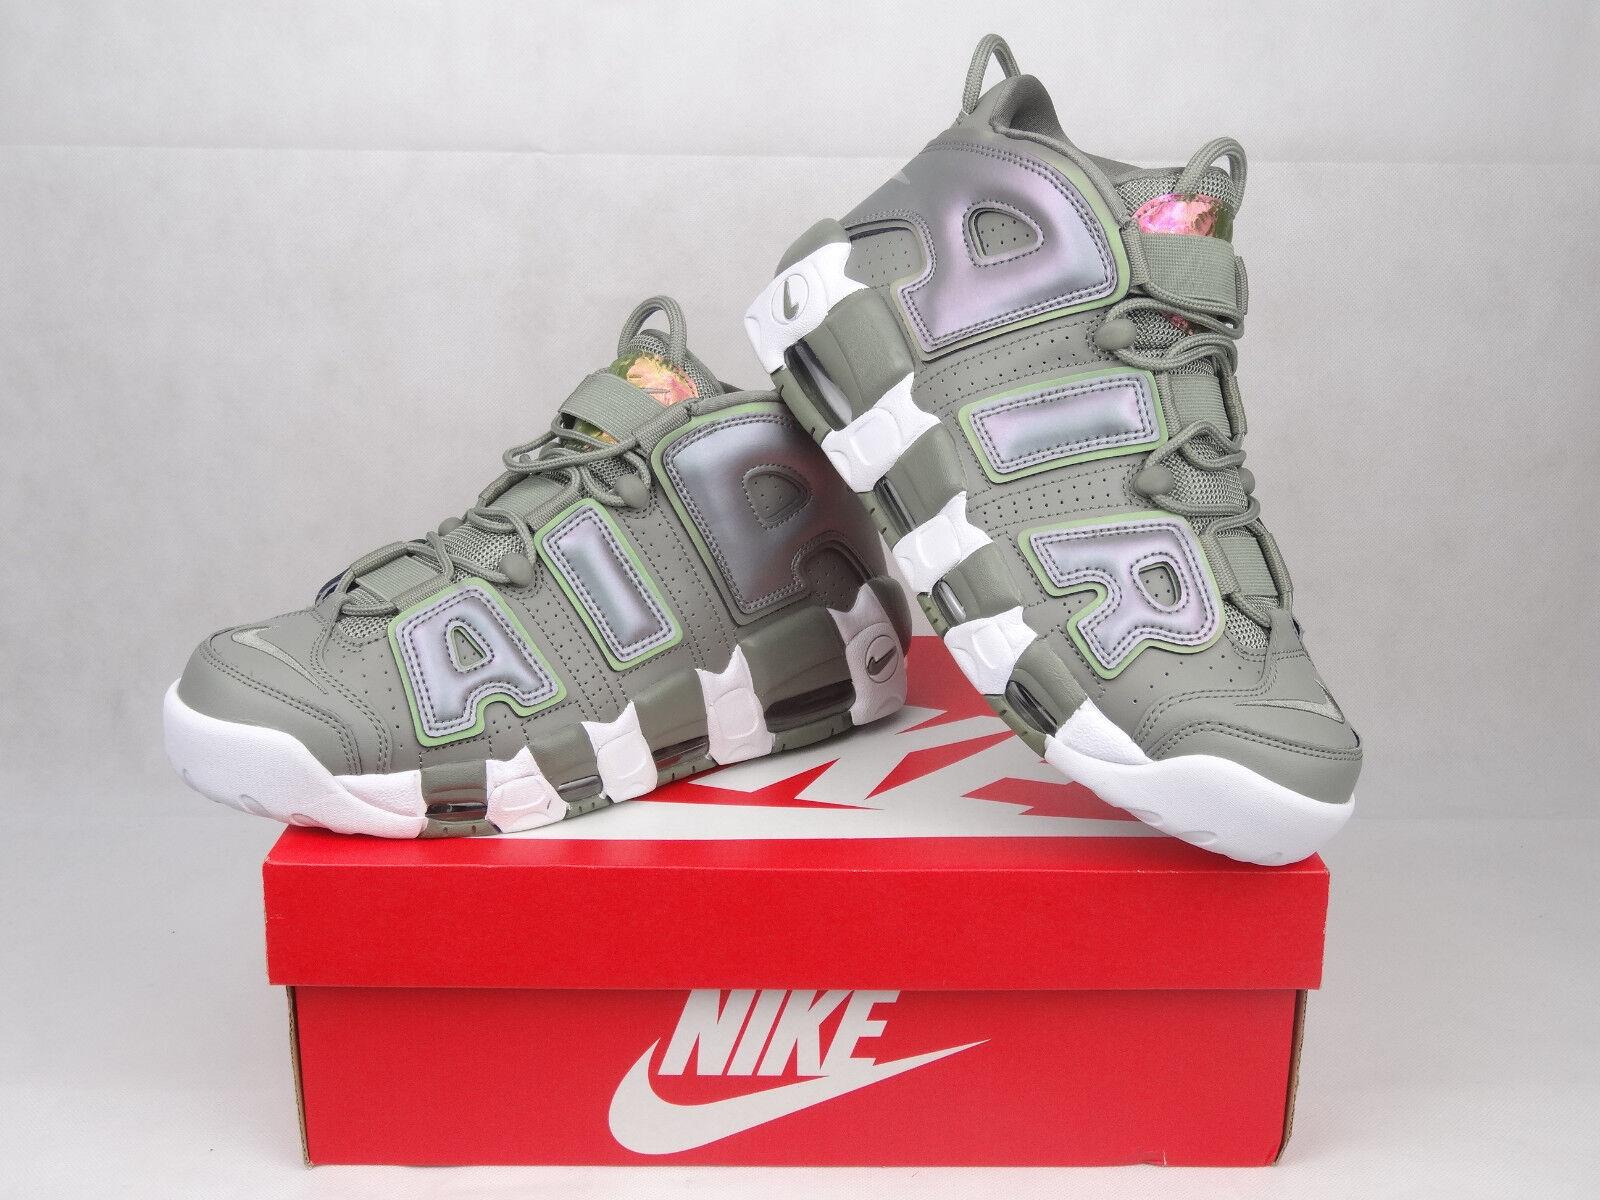 Nike Air More Uptempo Size Women Men Shoes Size Uptempo 7.5 UK / 42 EU Dark Stucco Green 8b3e12